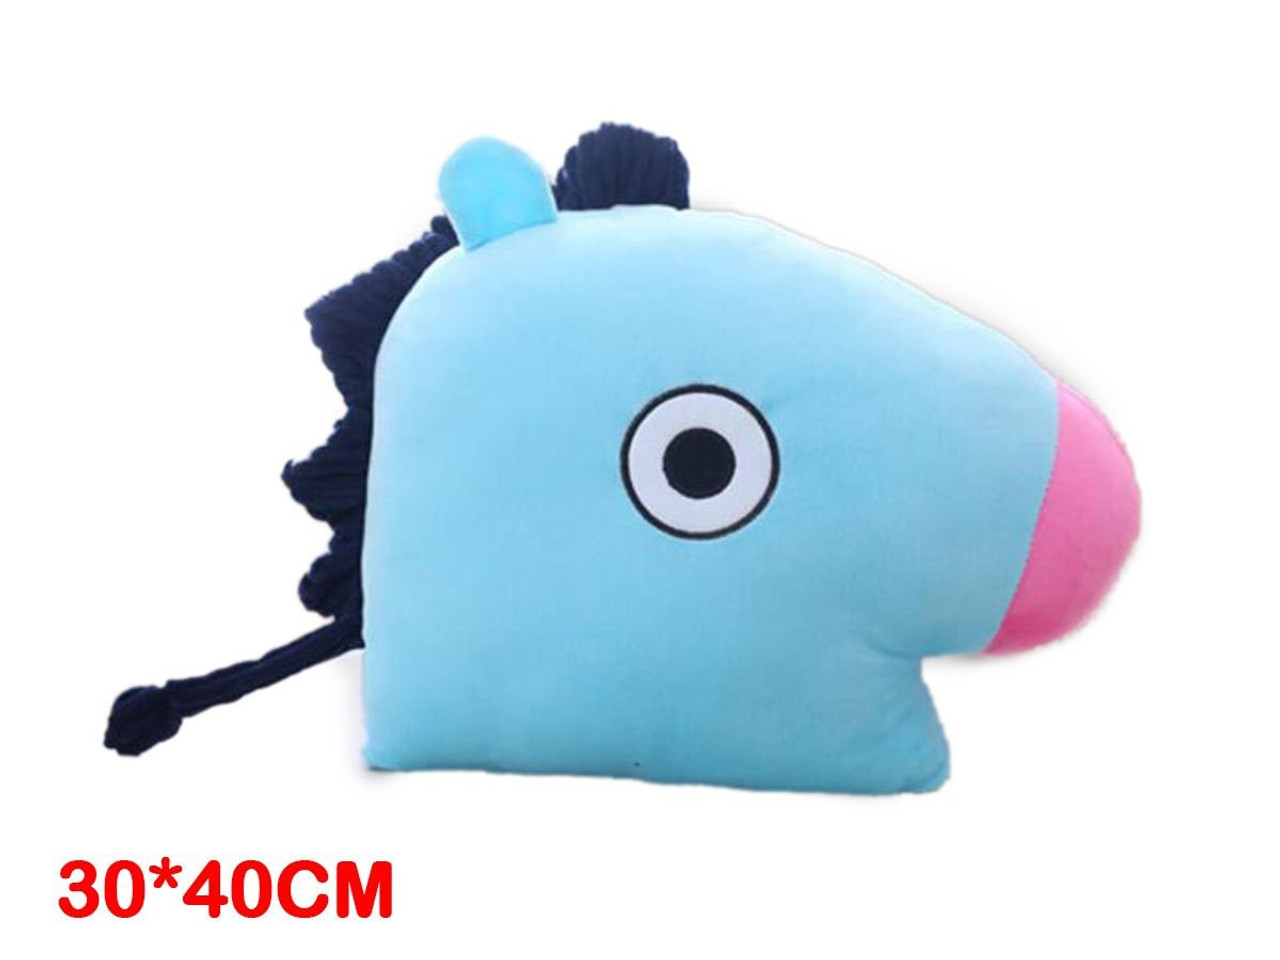 bt21 mang j hope pillow plush